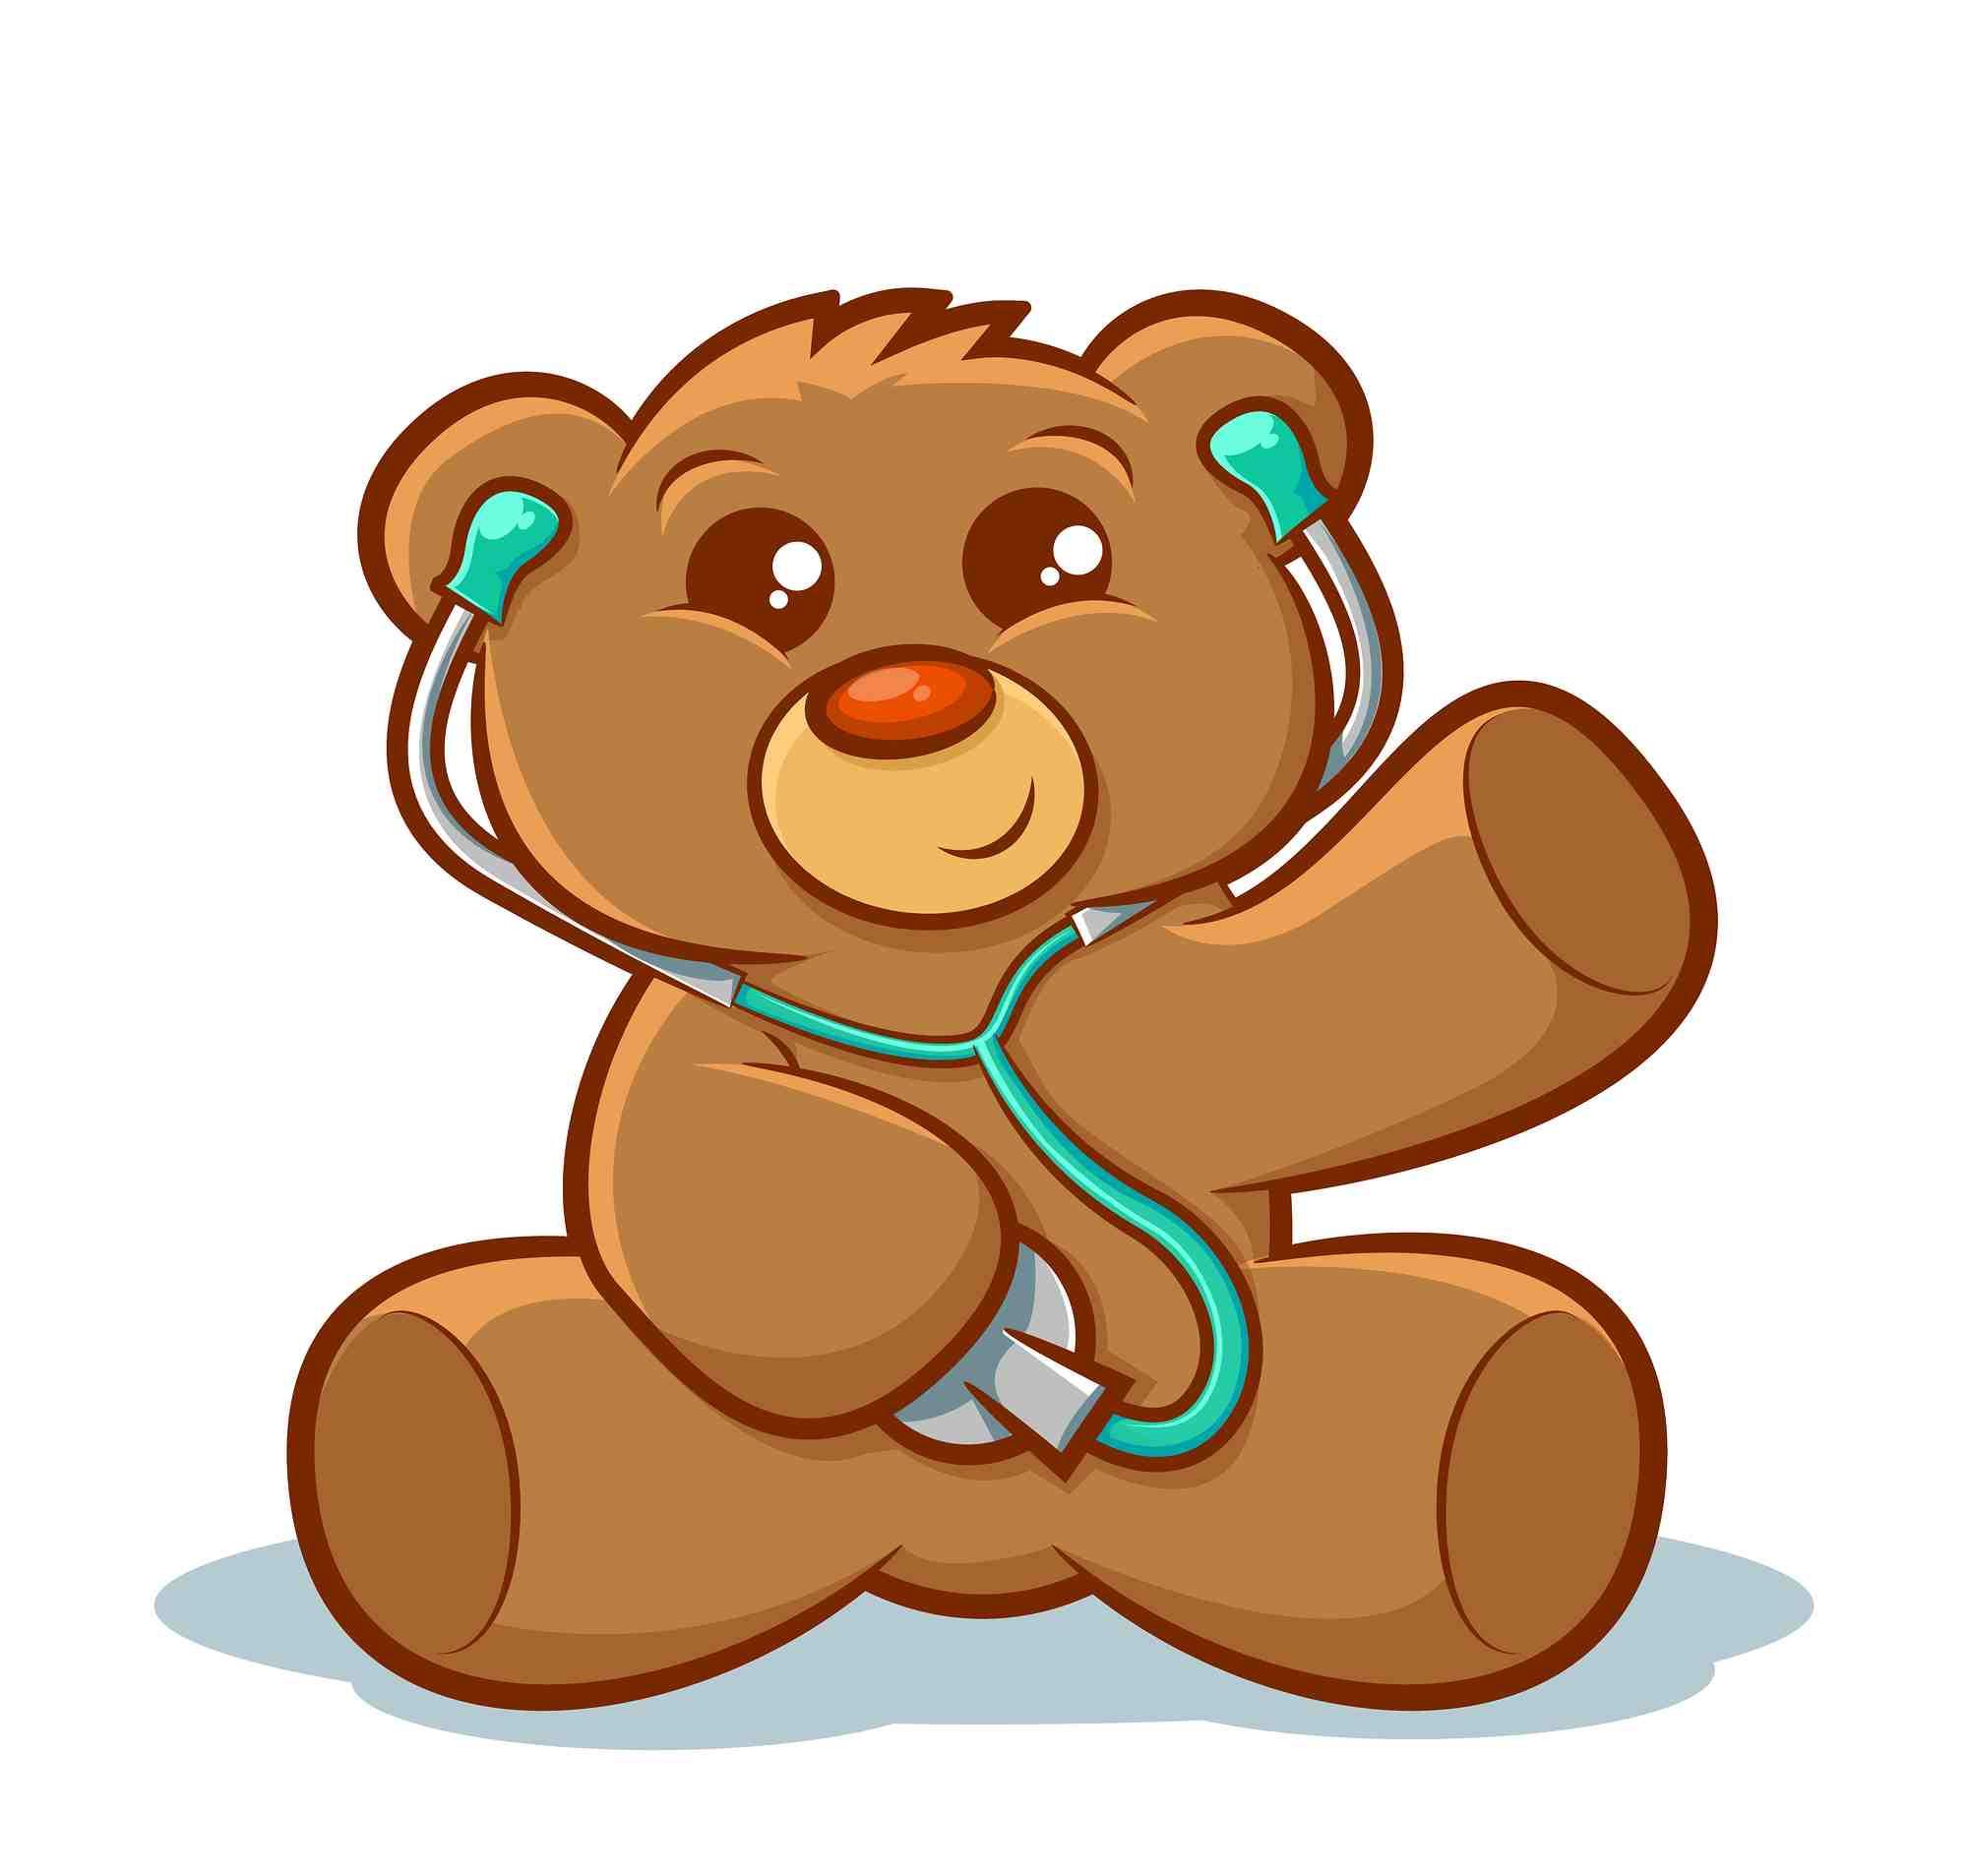 Medical clipart teddy bear Her of Memorial Crawford Let